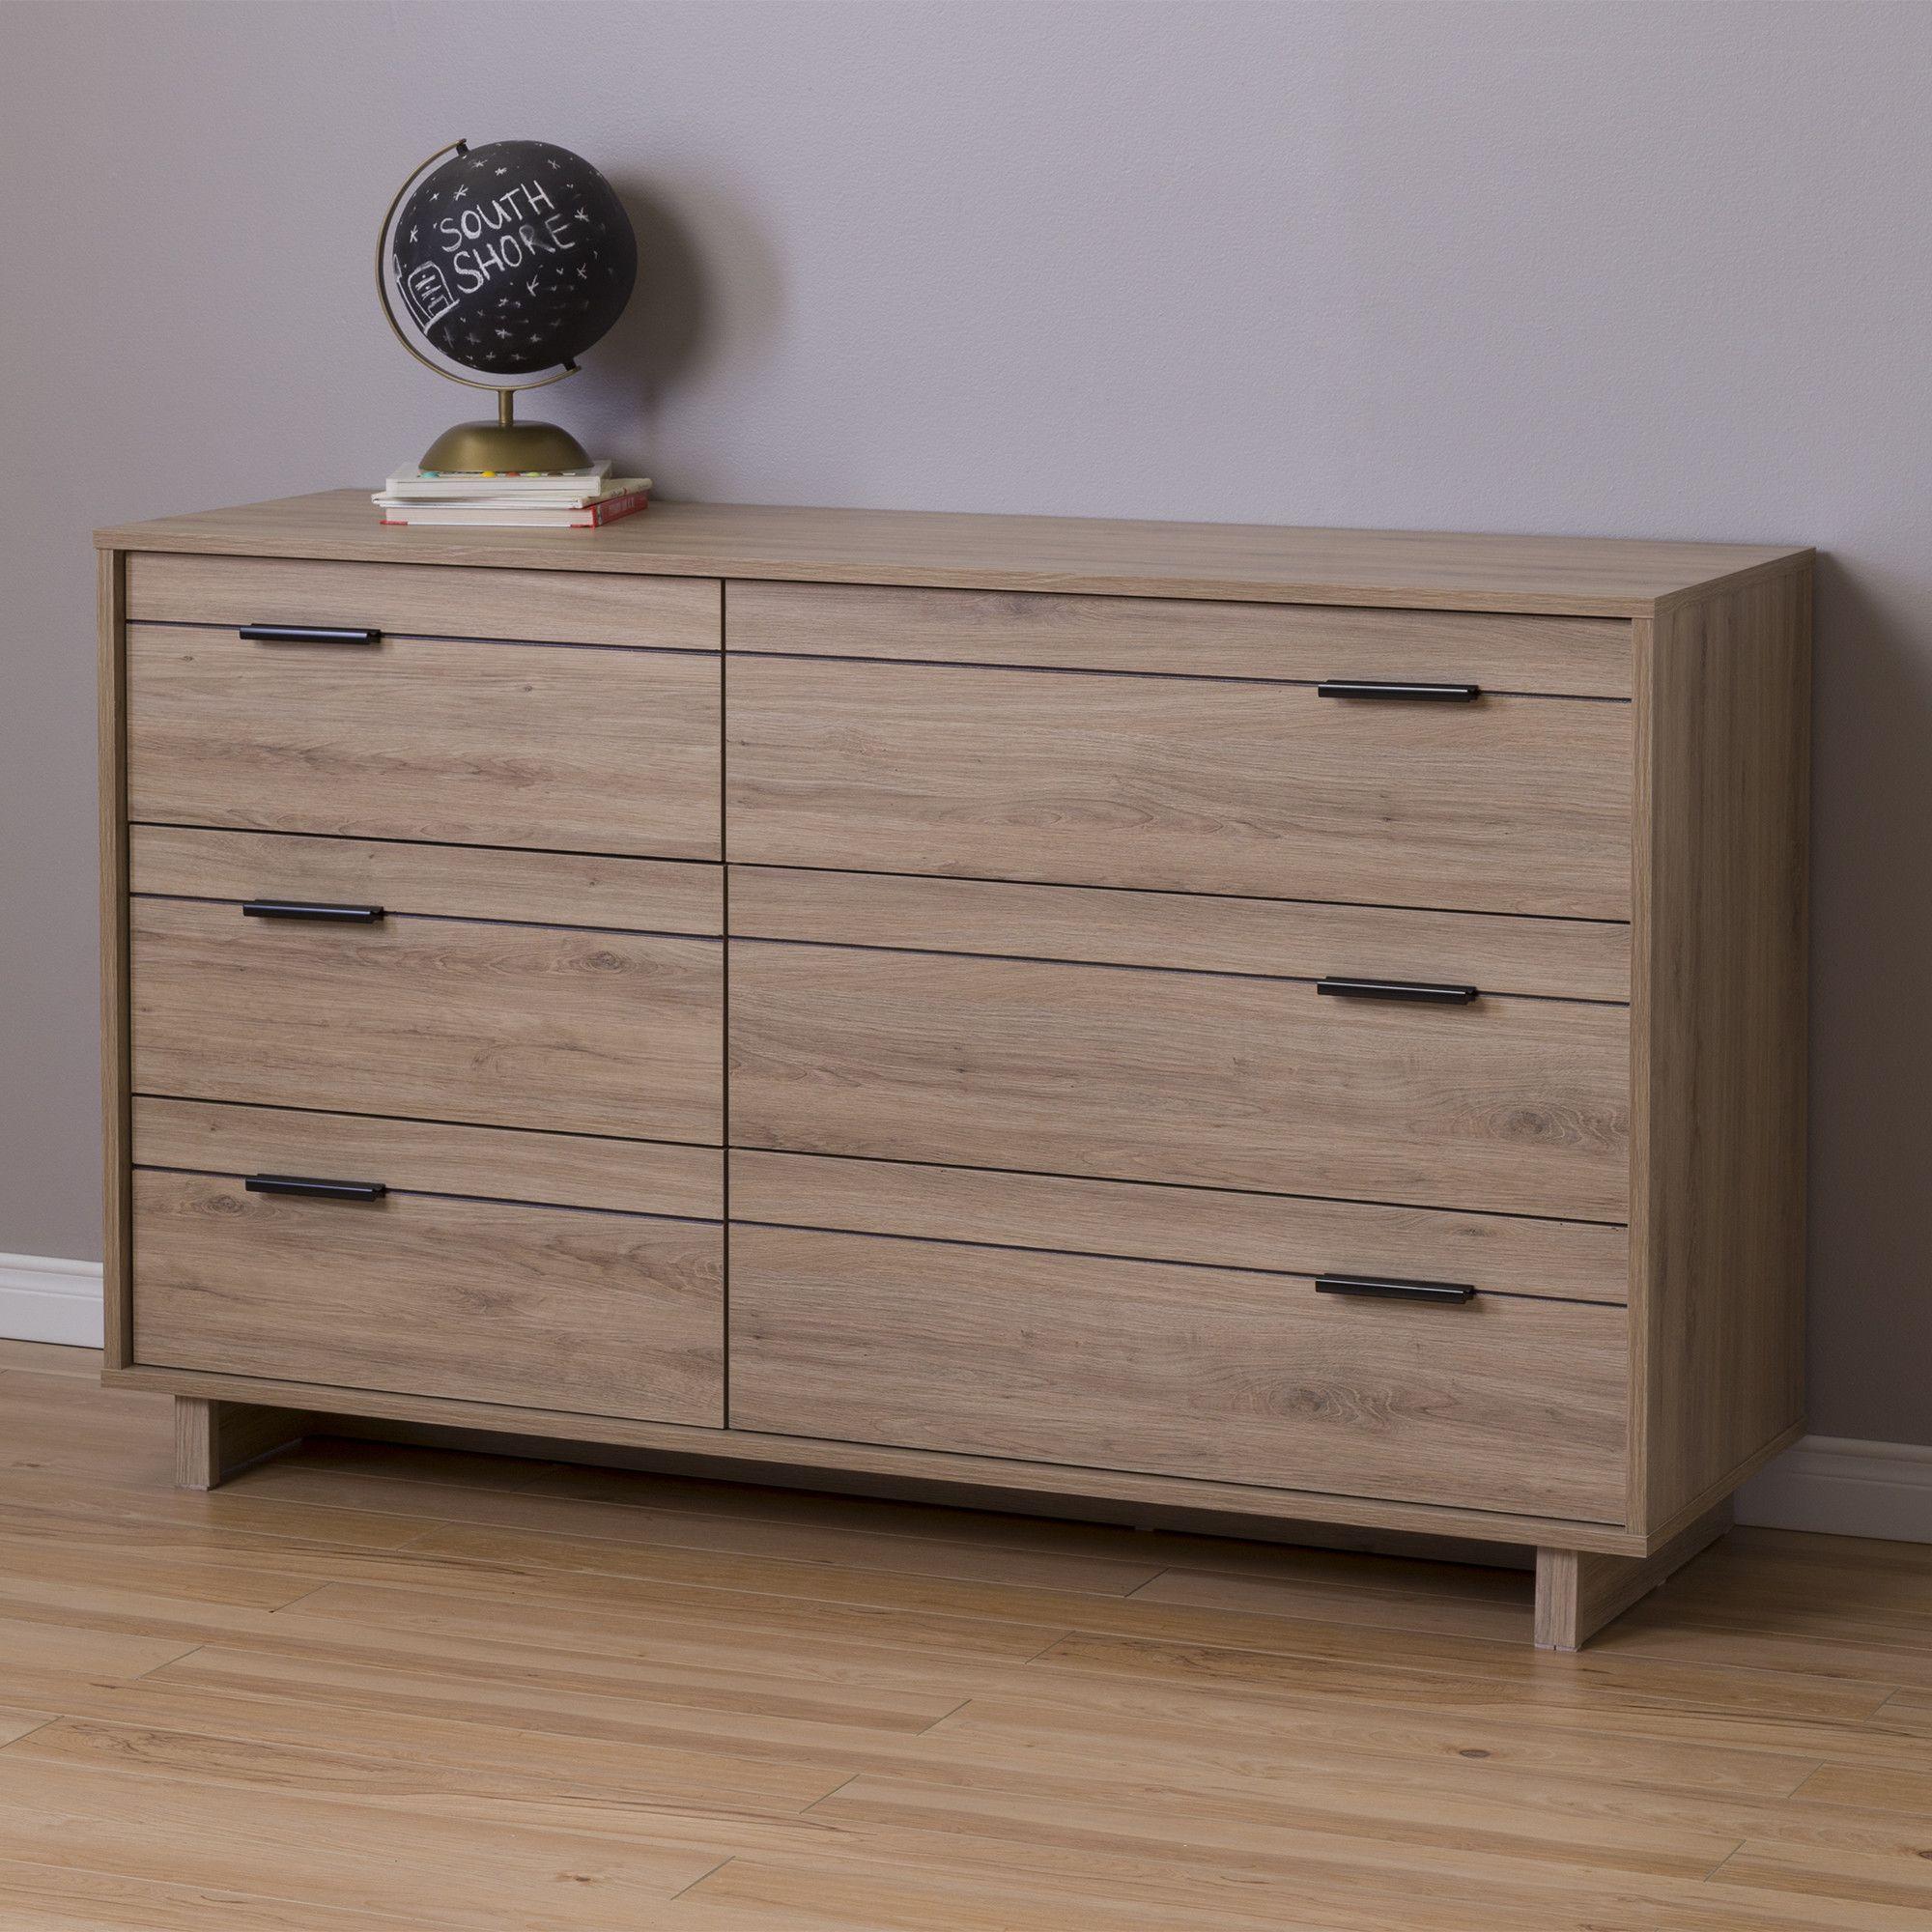 Fynn 6 Drawer Double Dresser Hout